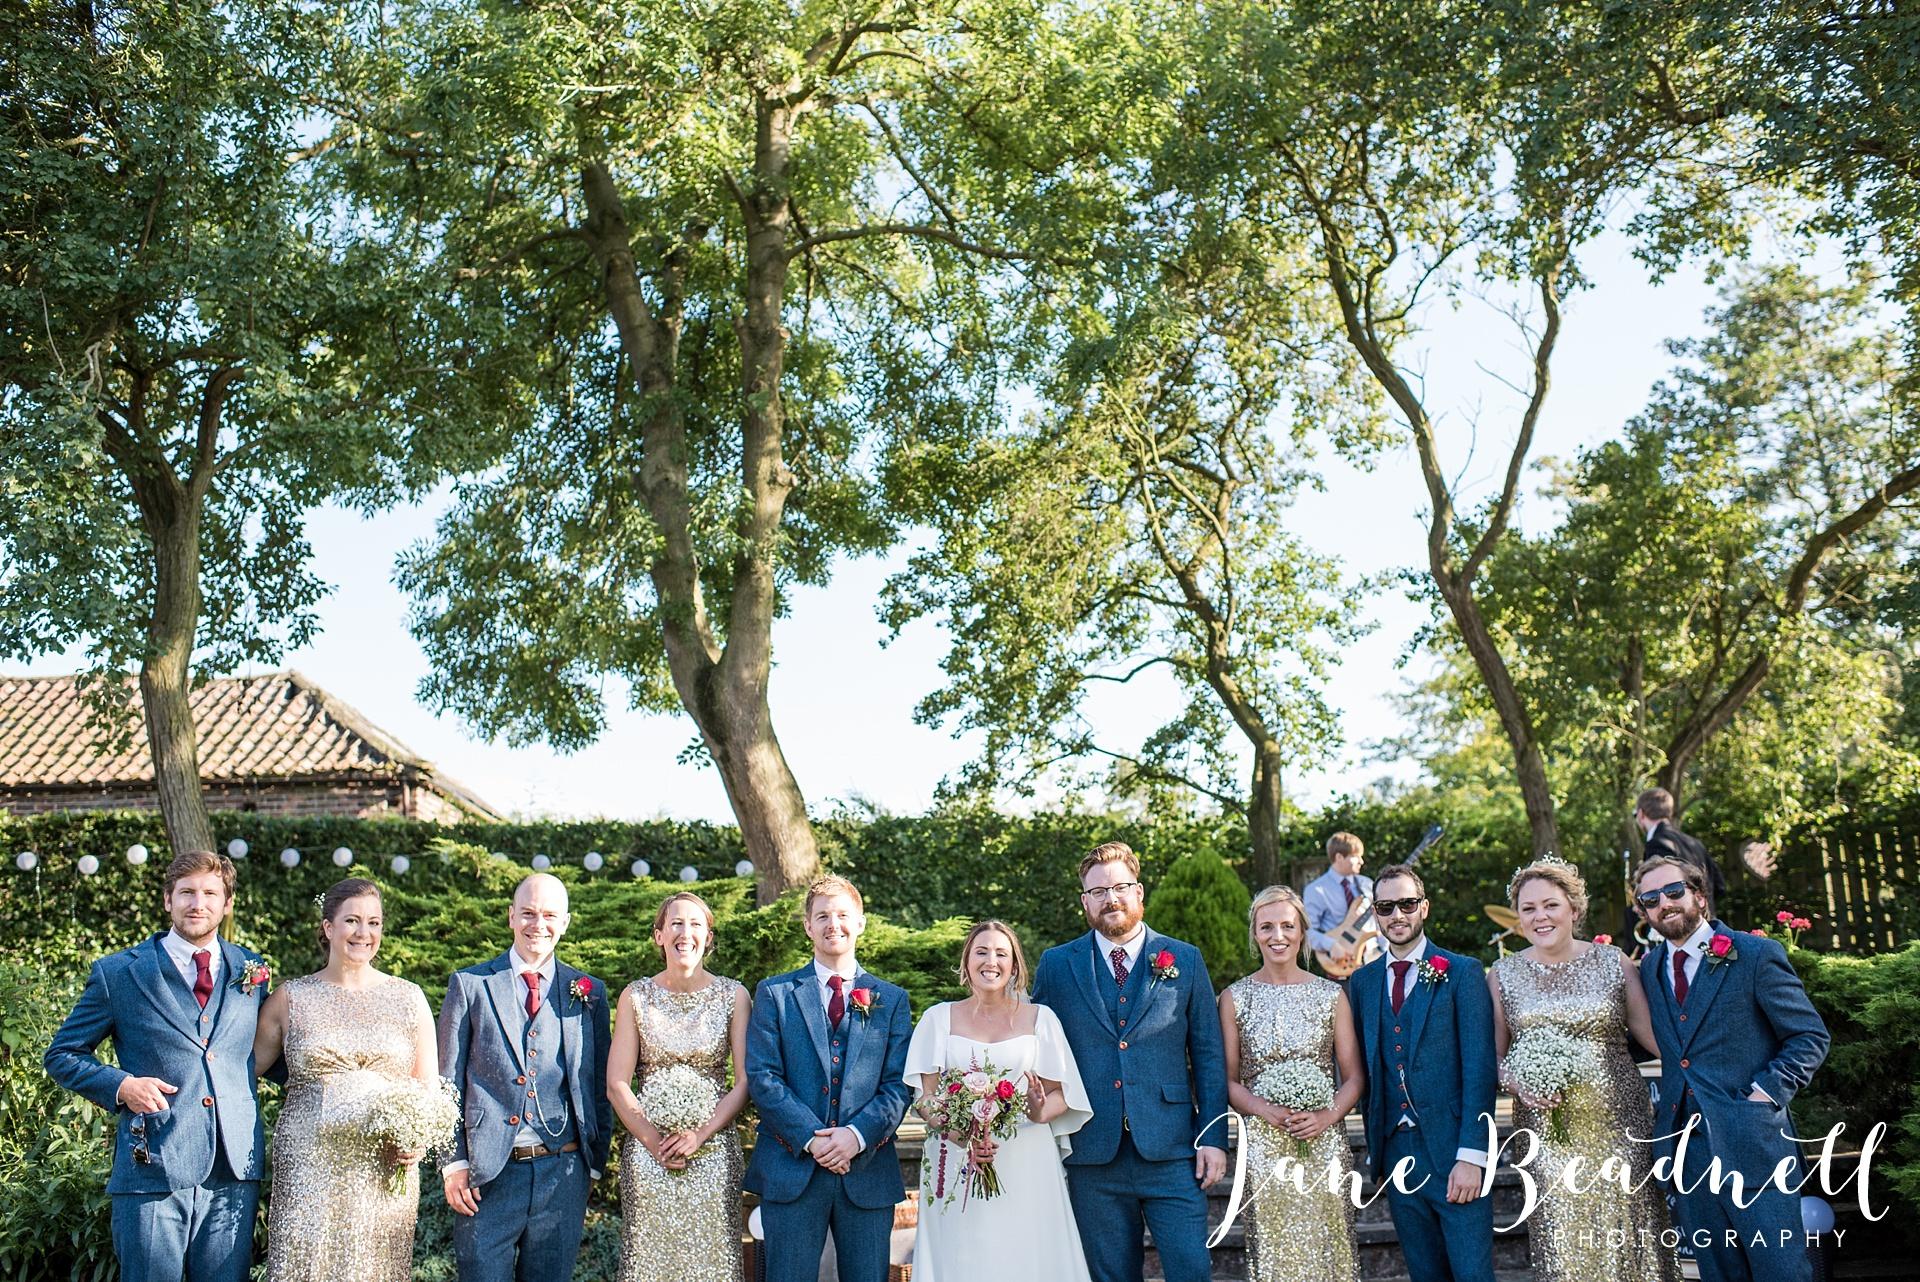 fine-art-wedding-photographer-jane-beadnell-yorkshire-wedding-photographer-garden-wedding_0114